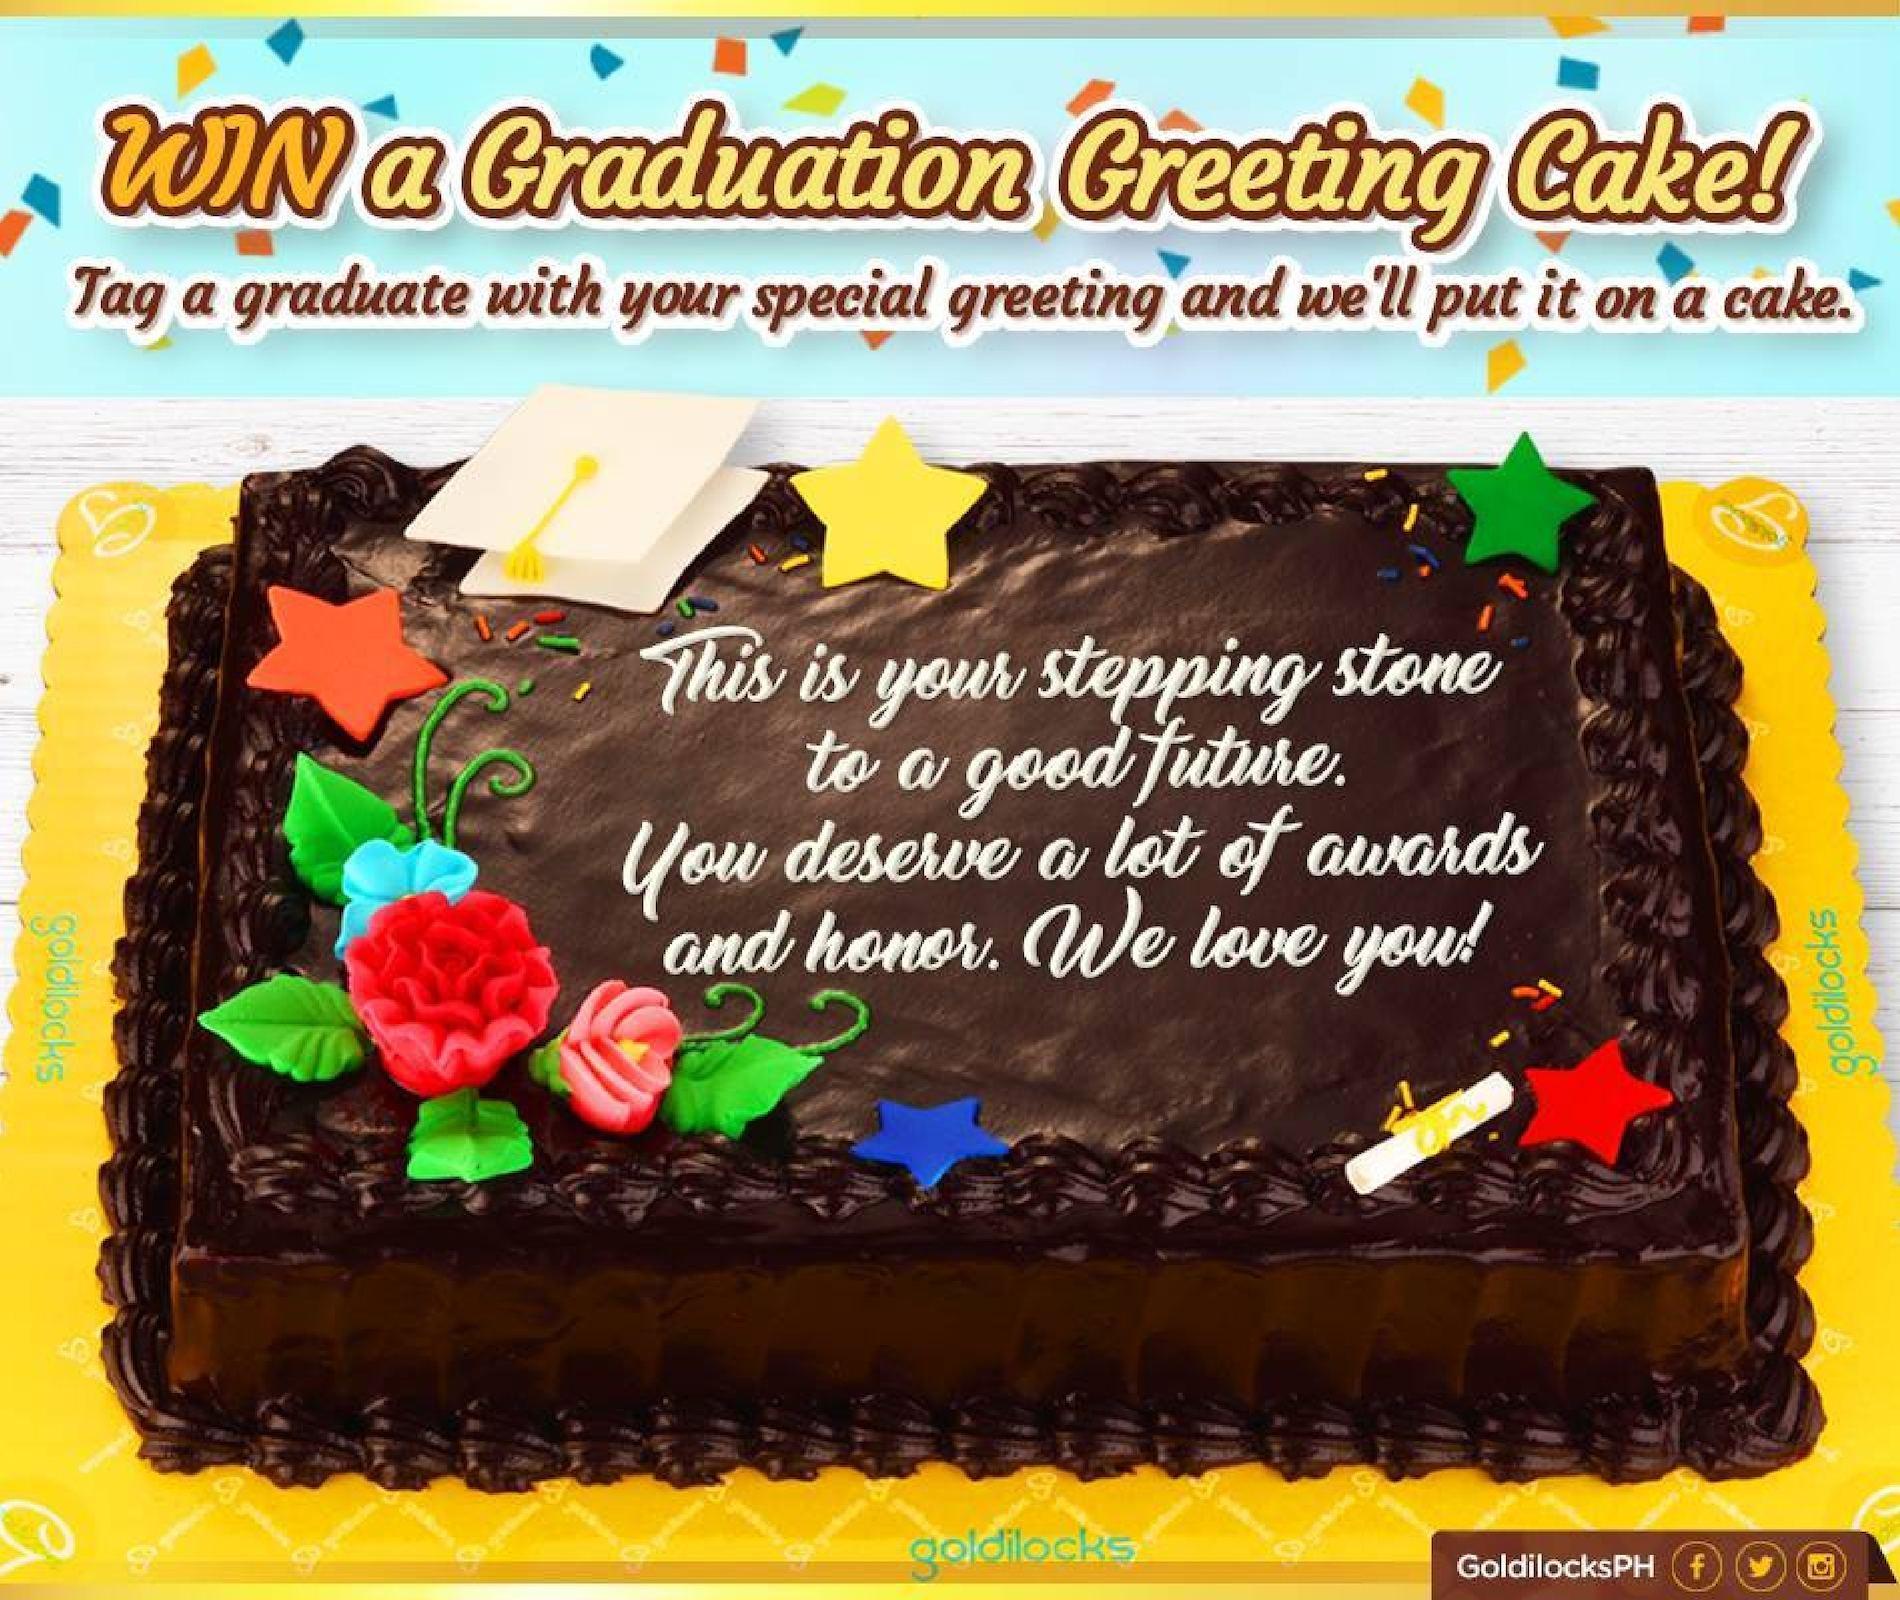 Calamo Win A Graduation Greeting Cake From Goldilocks For A